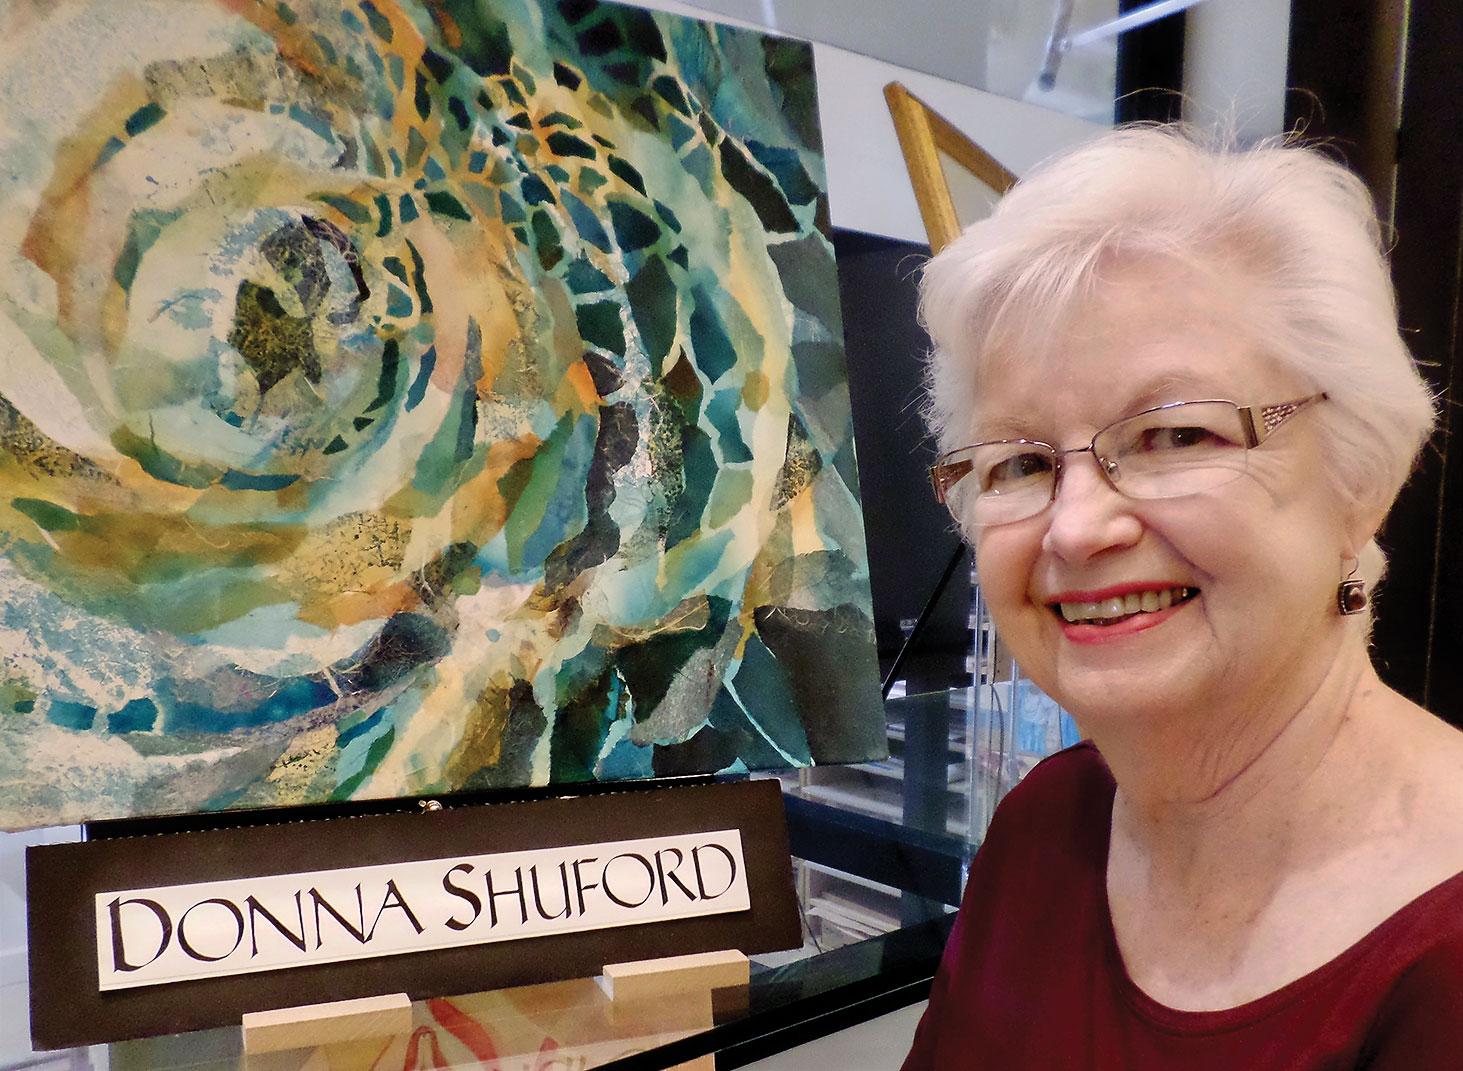 Donna Shuford, a Robson Ranch resident artist